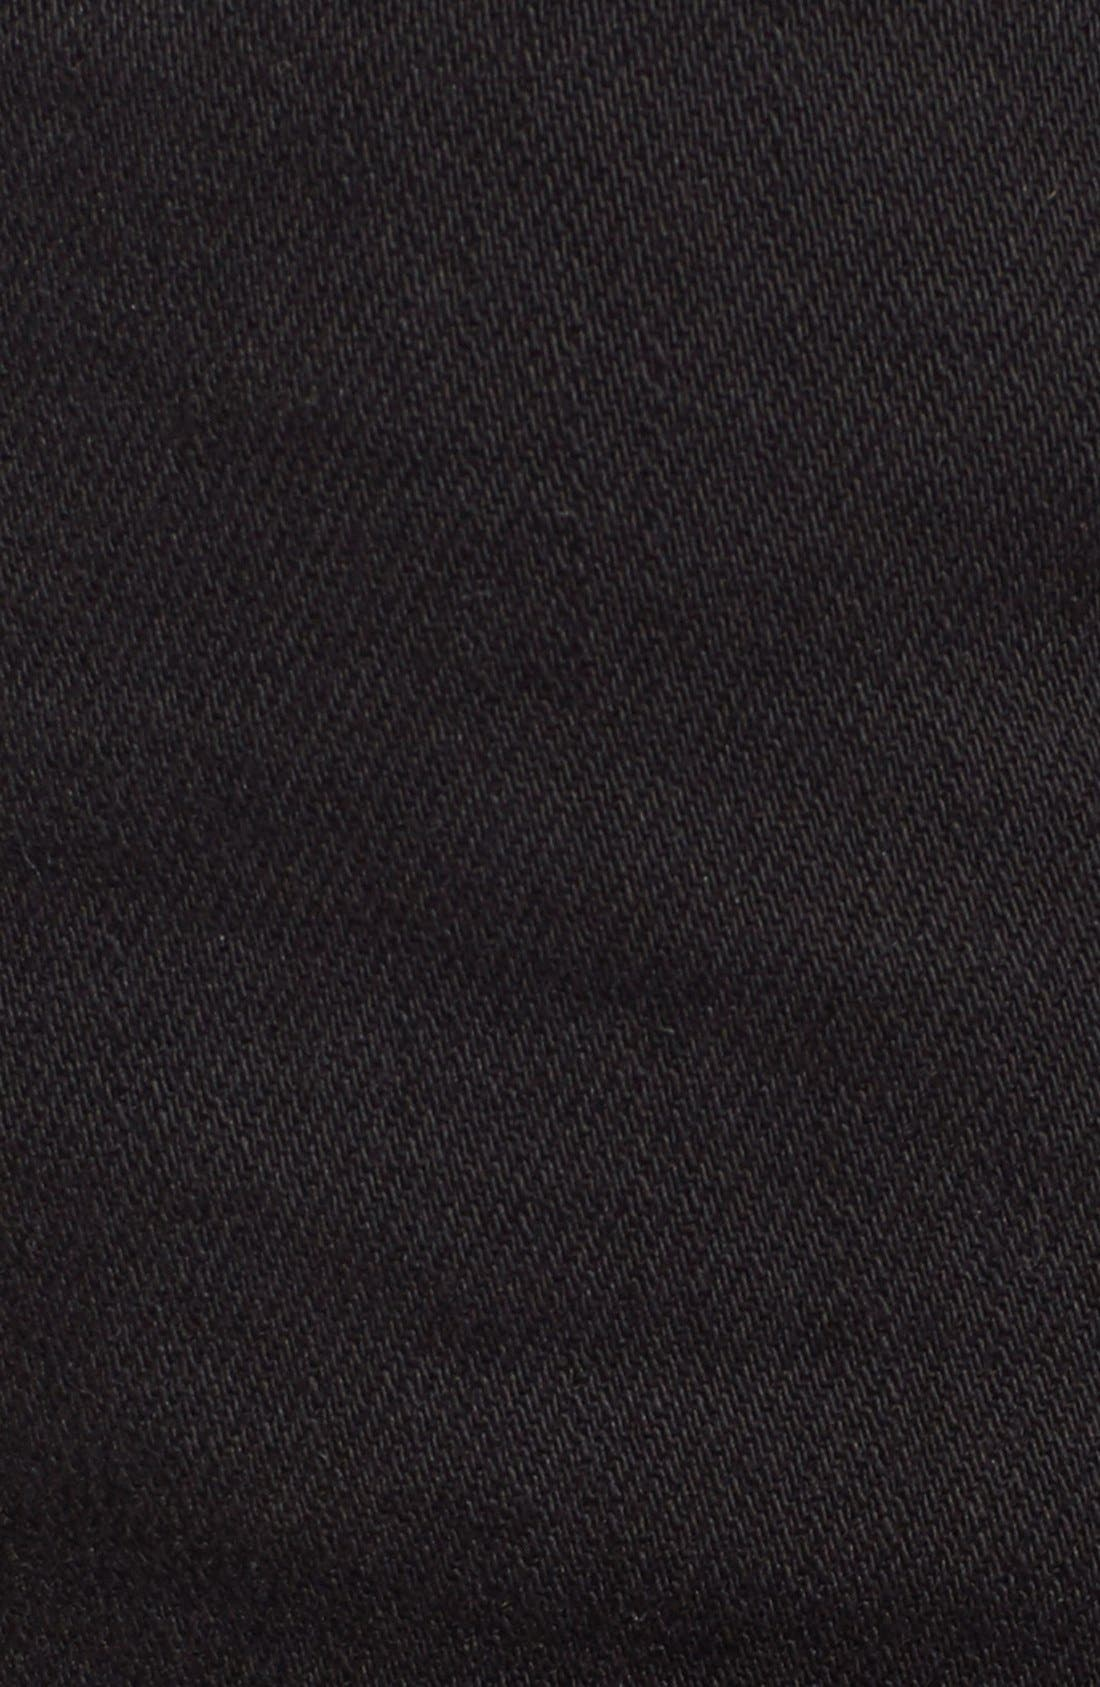 Joey Flap Pocket Cutoff Denim Shorts,                             Alternate thumbnail 5, color,                             Jet Black